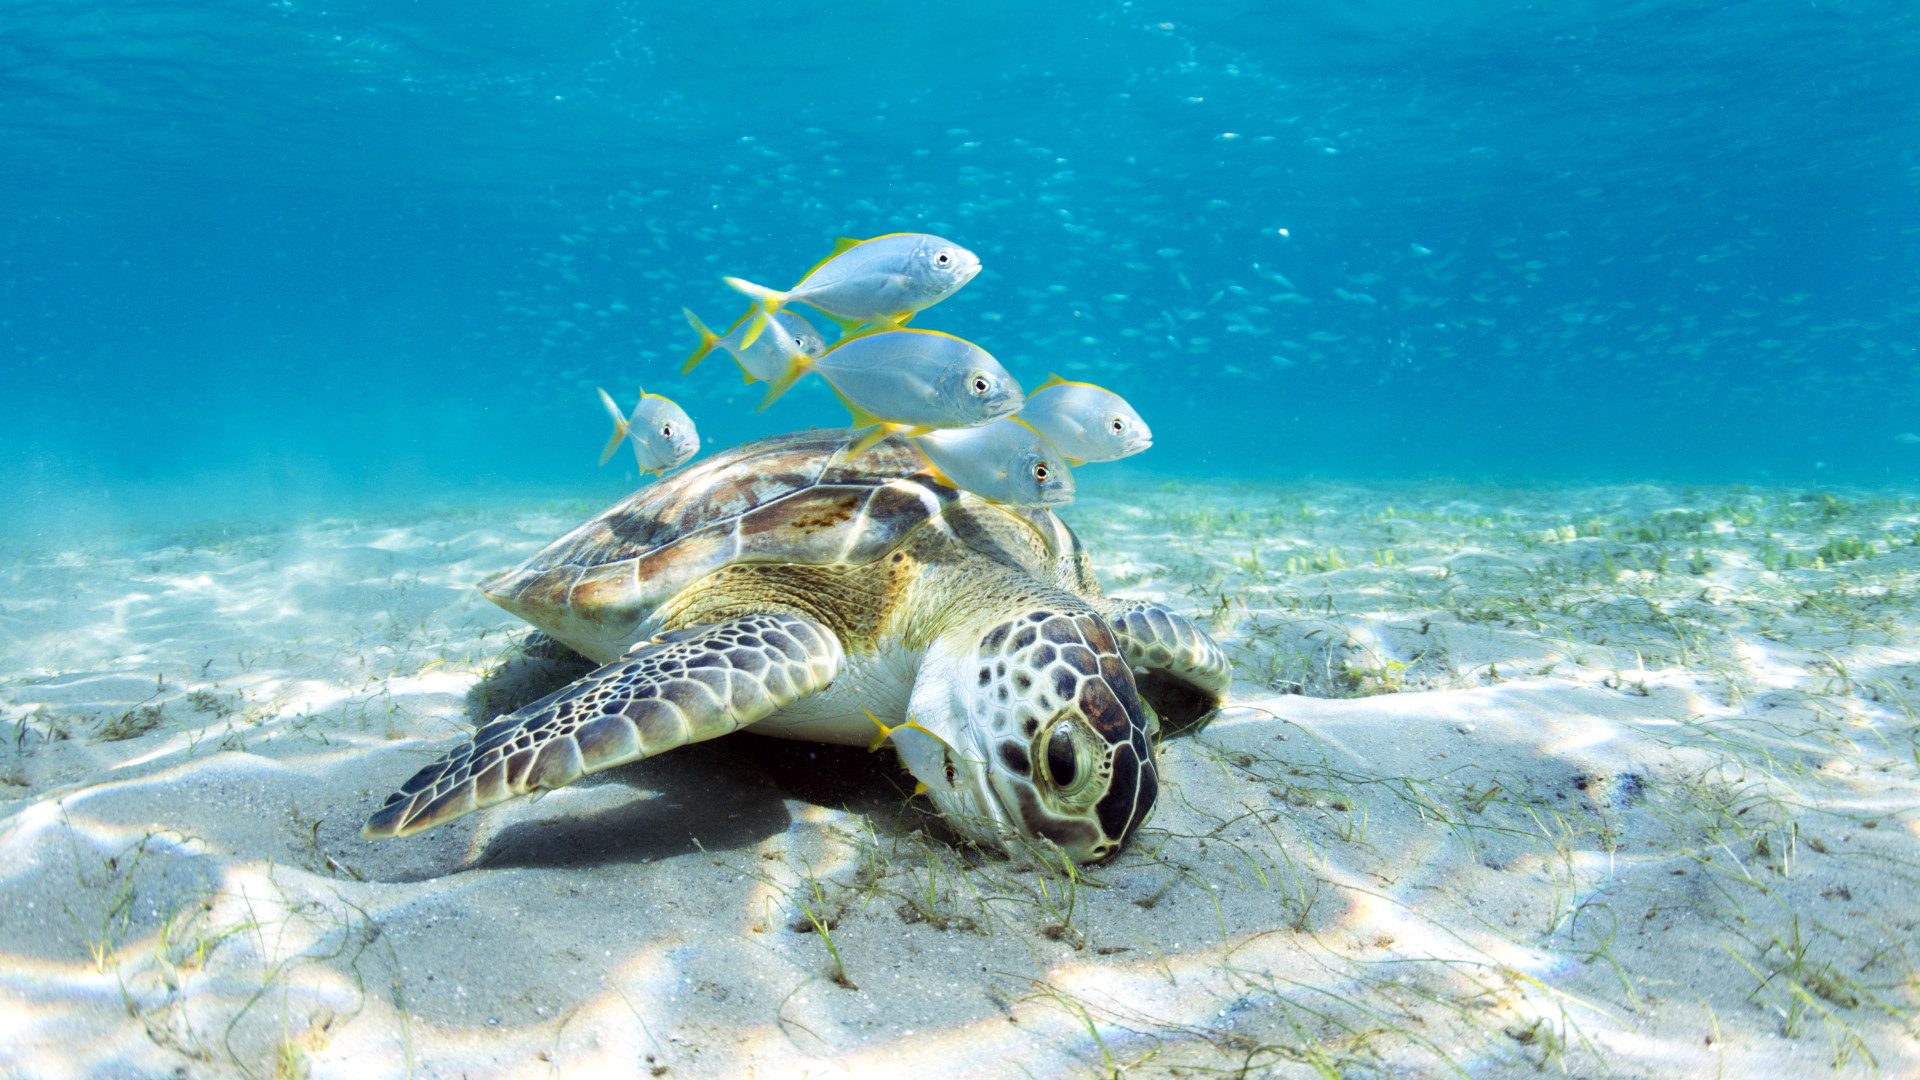 Sealife in Palm Beaches, Florida